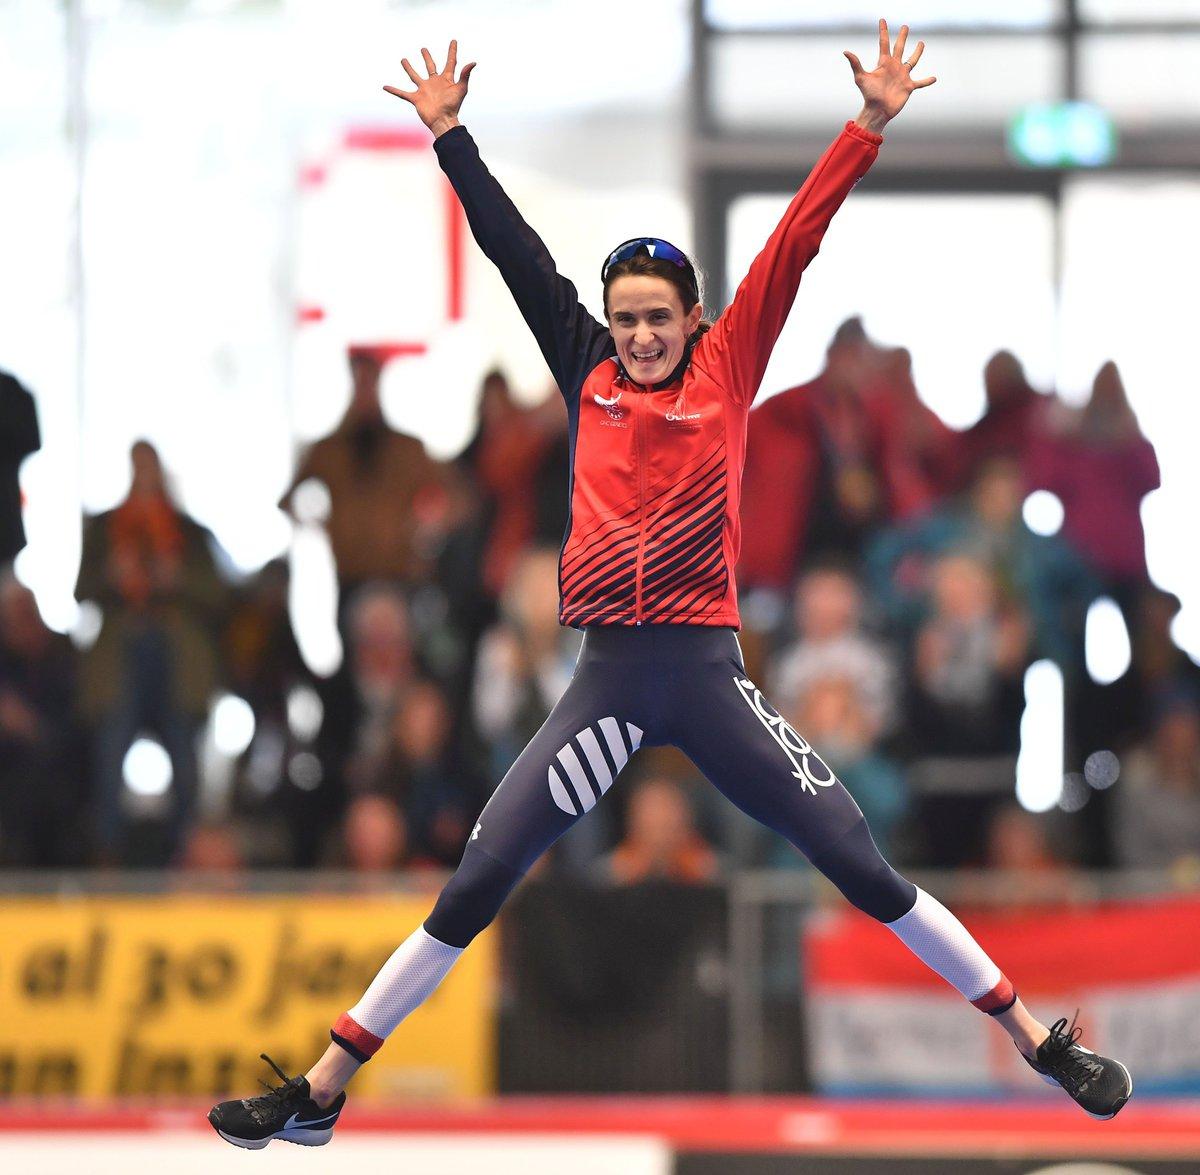 Obrovská radost po titulu v Inzellu 2019